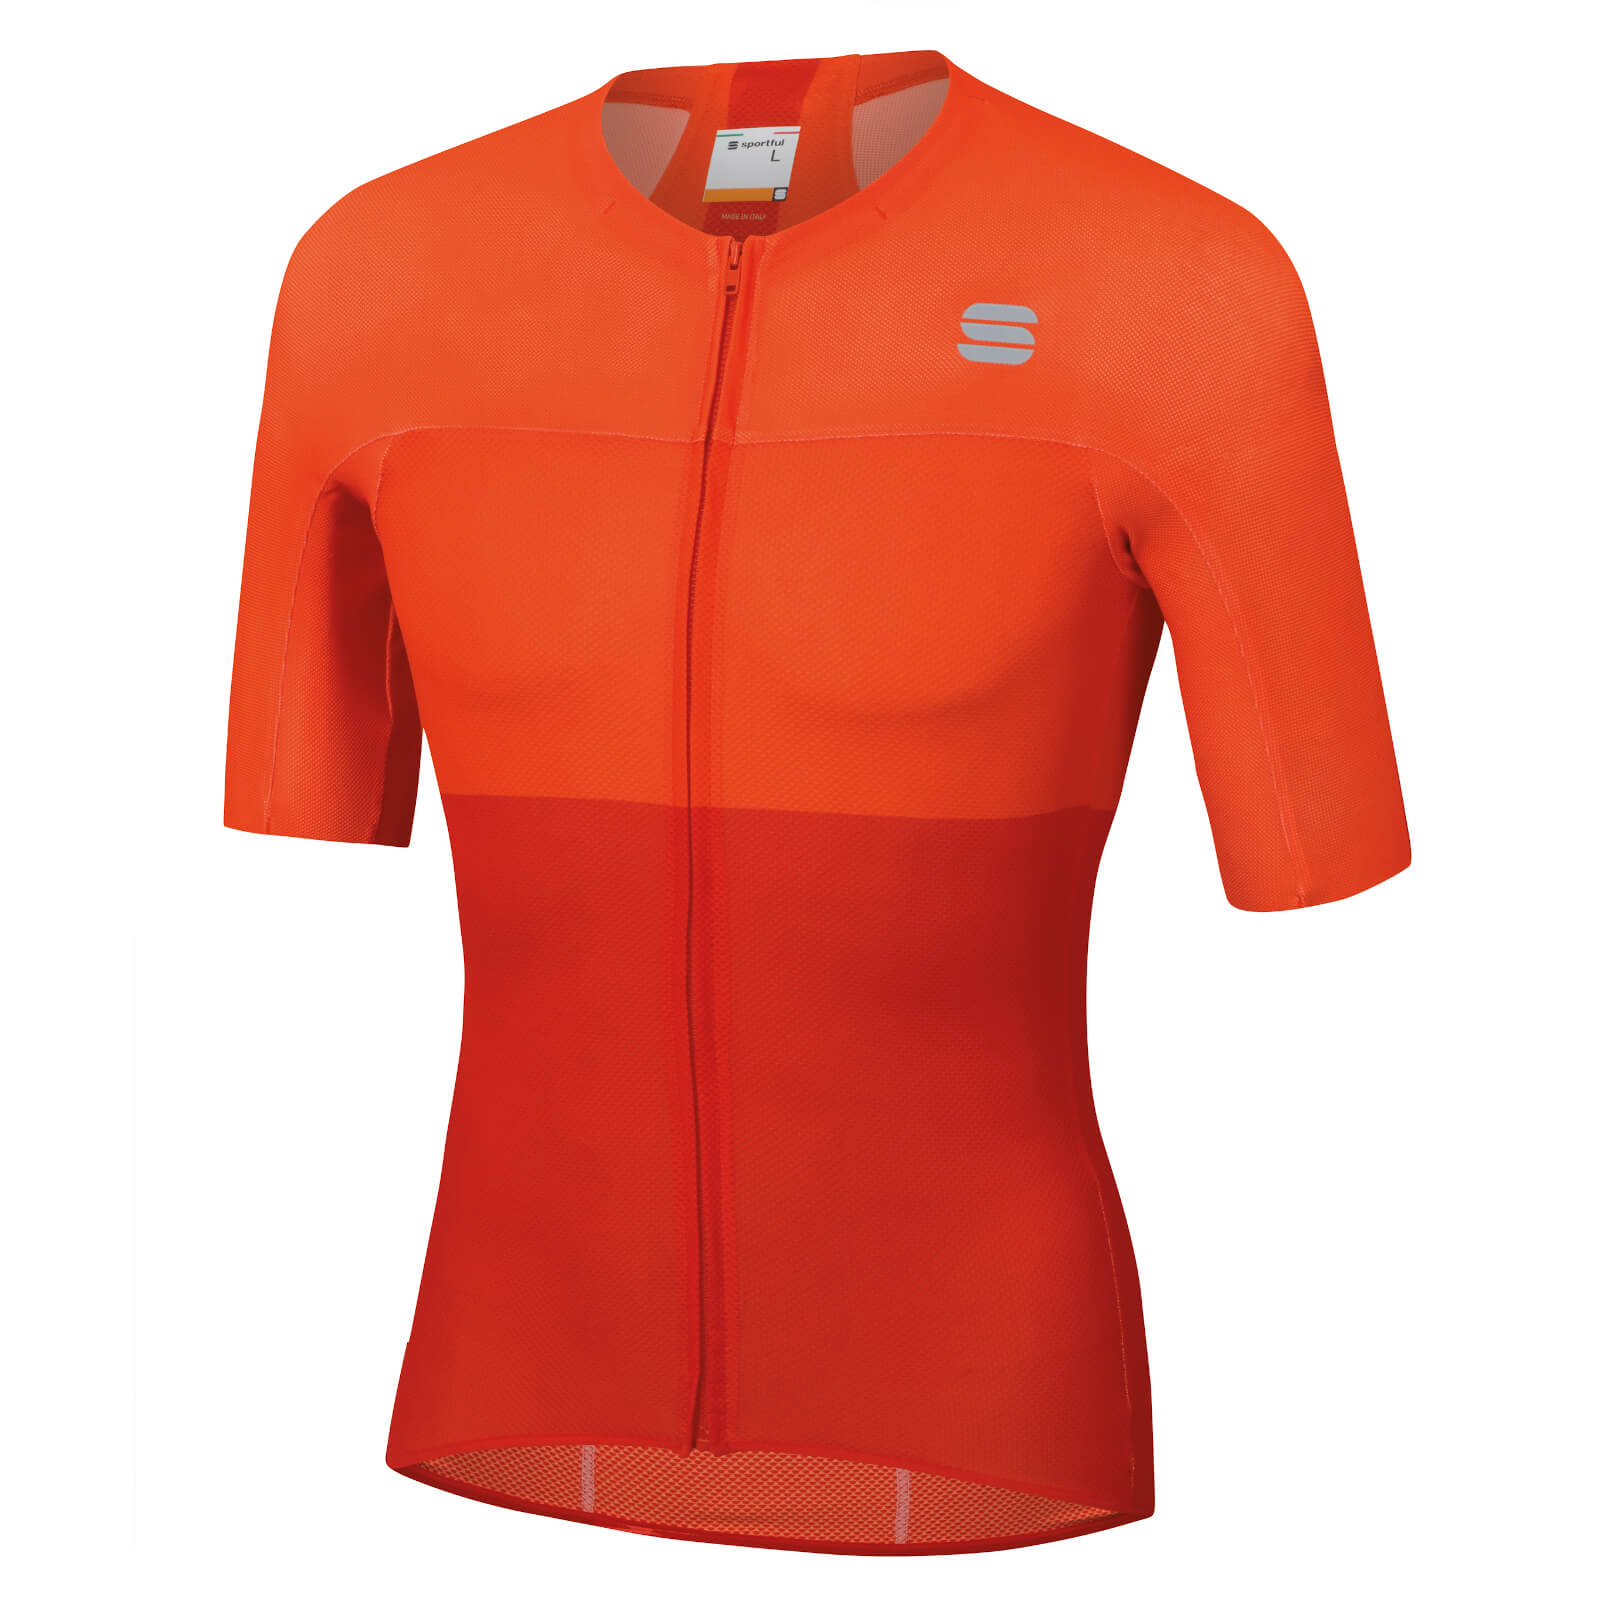 Sportful BodyFit Pro Light Jersey - S - Fire Red/Orange SDR